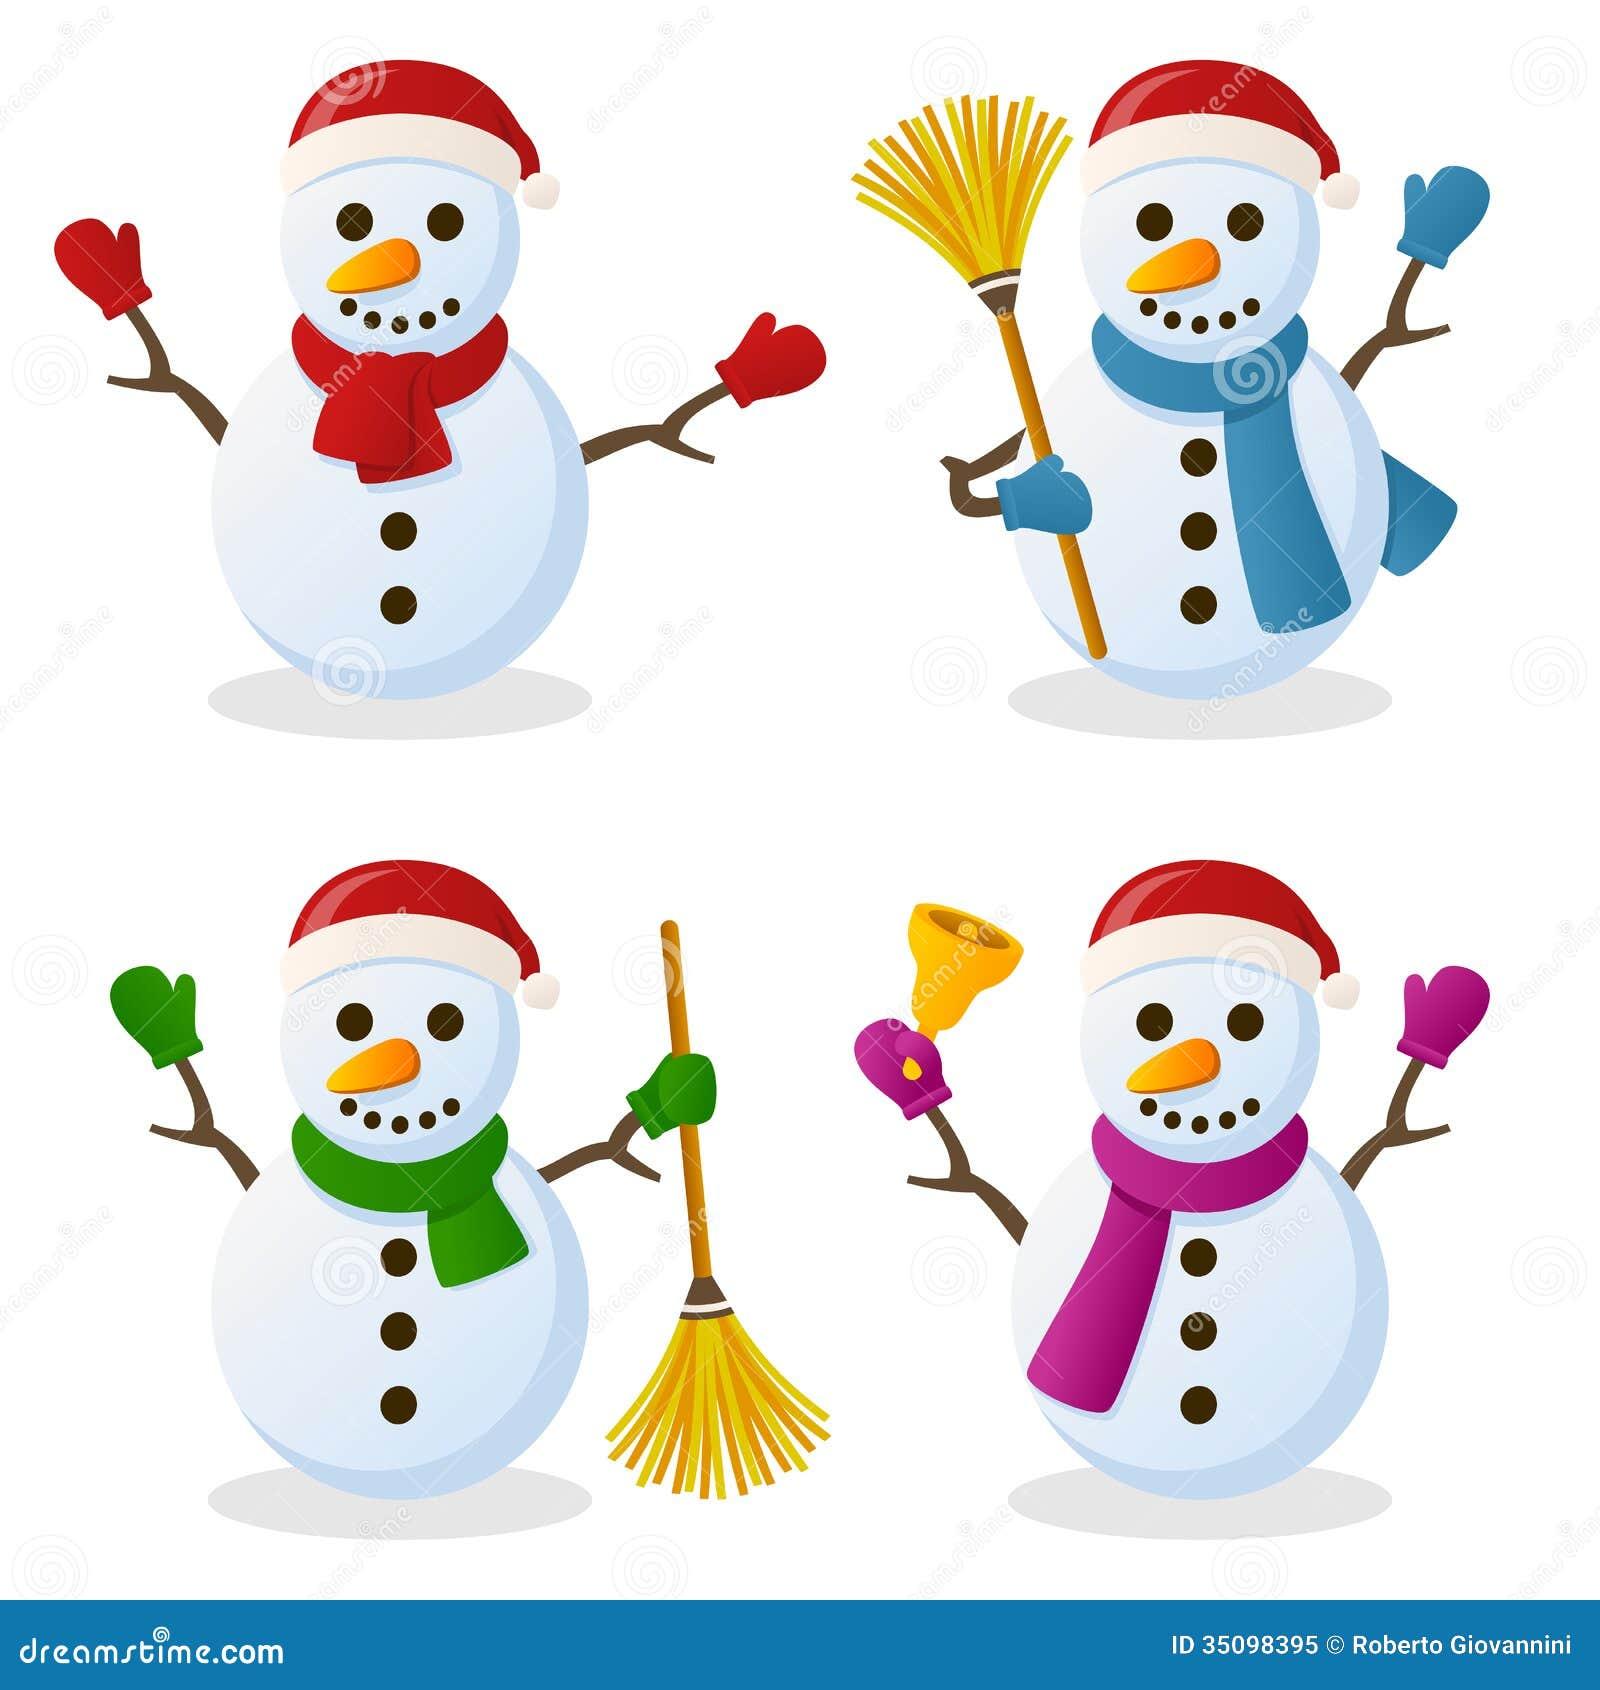 Christmas Images Free Cartoon.Snowman Cartoon Christmas Set Stock Vector Illustration Of